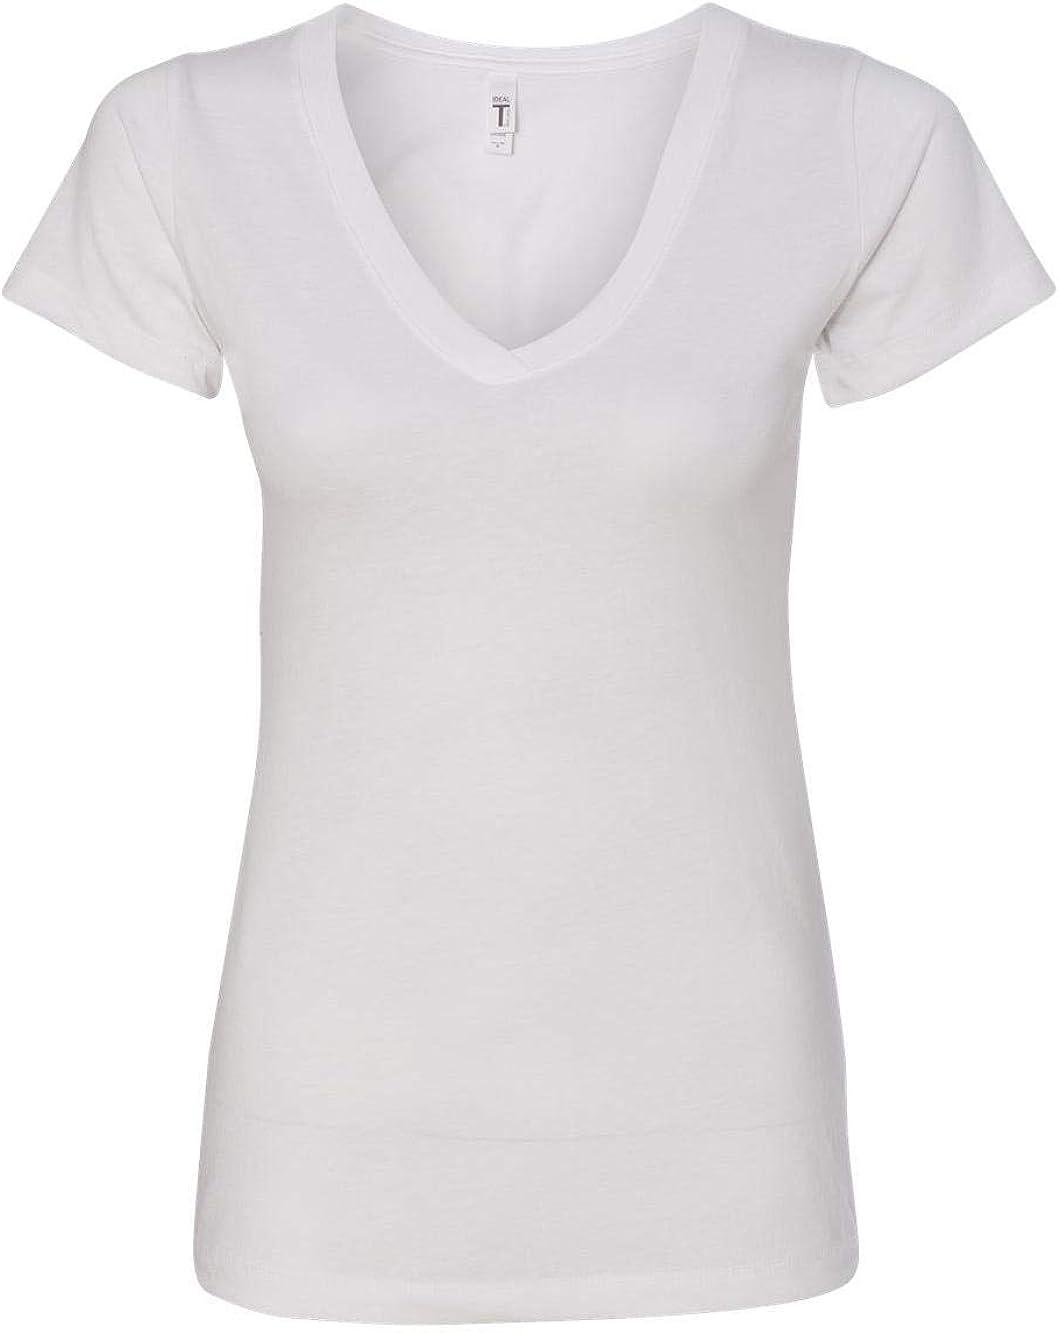 Next Level Women's 1X1 Baby Ideal V-Neck T-Shirt